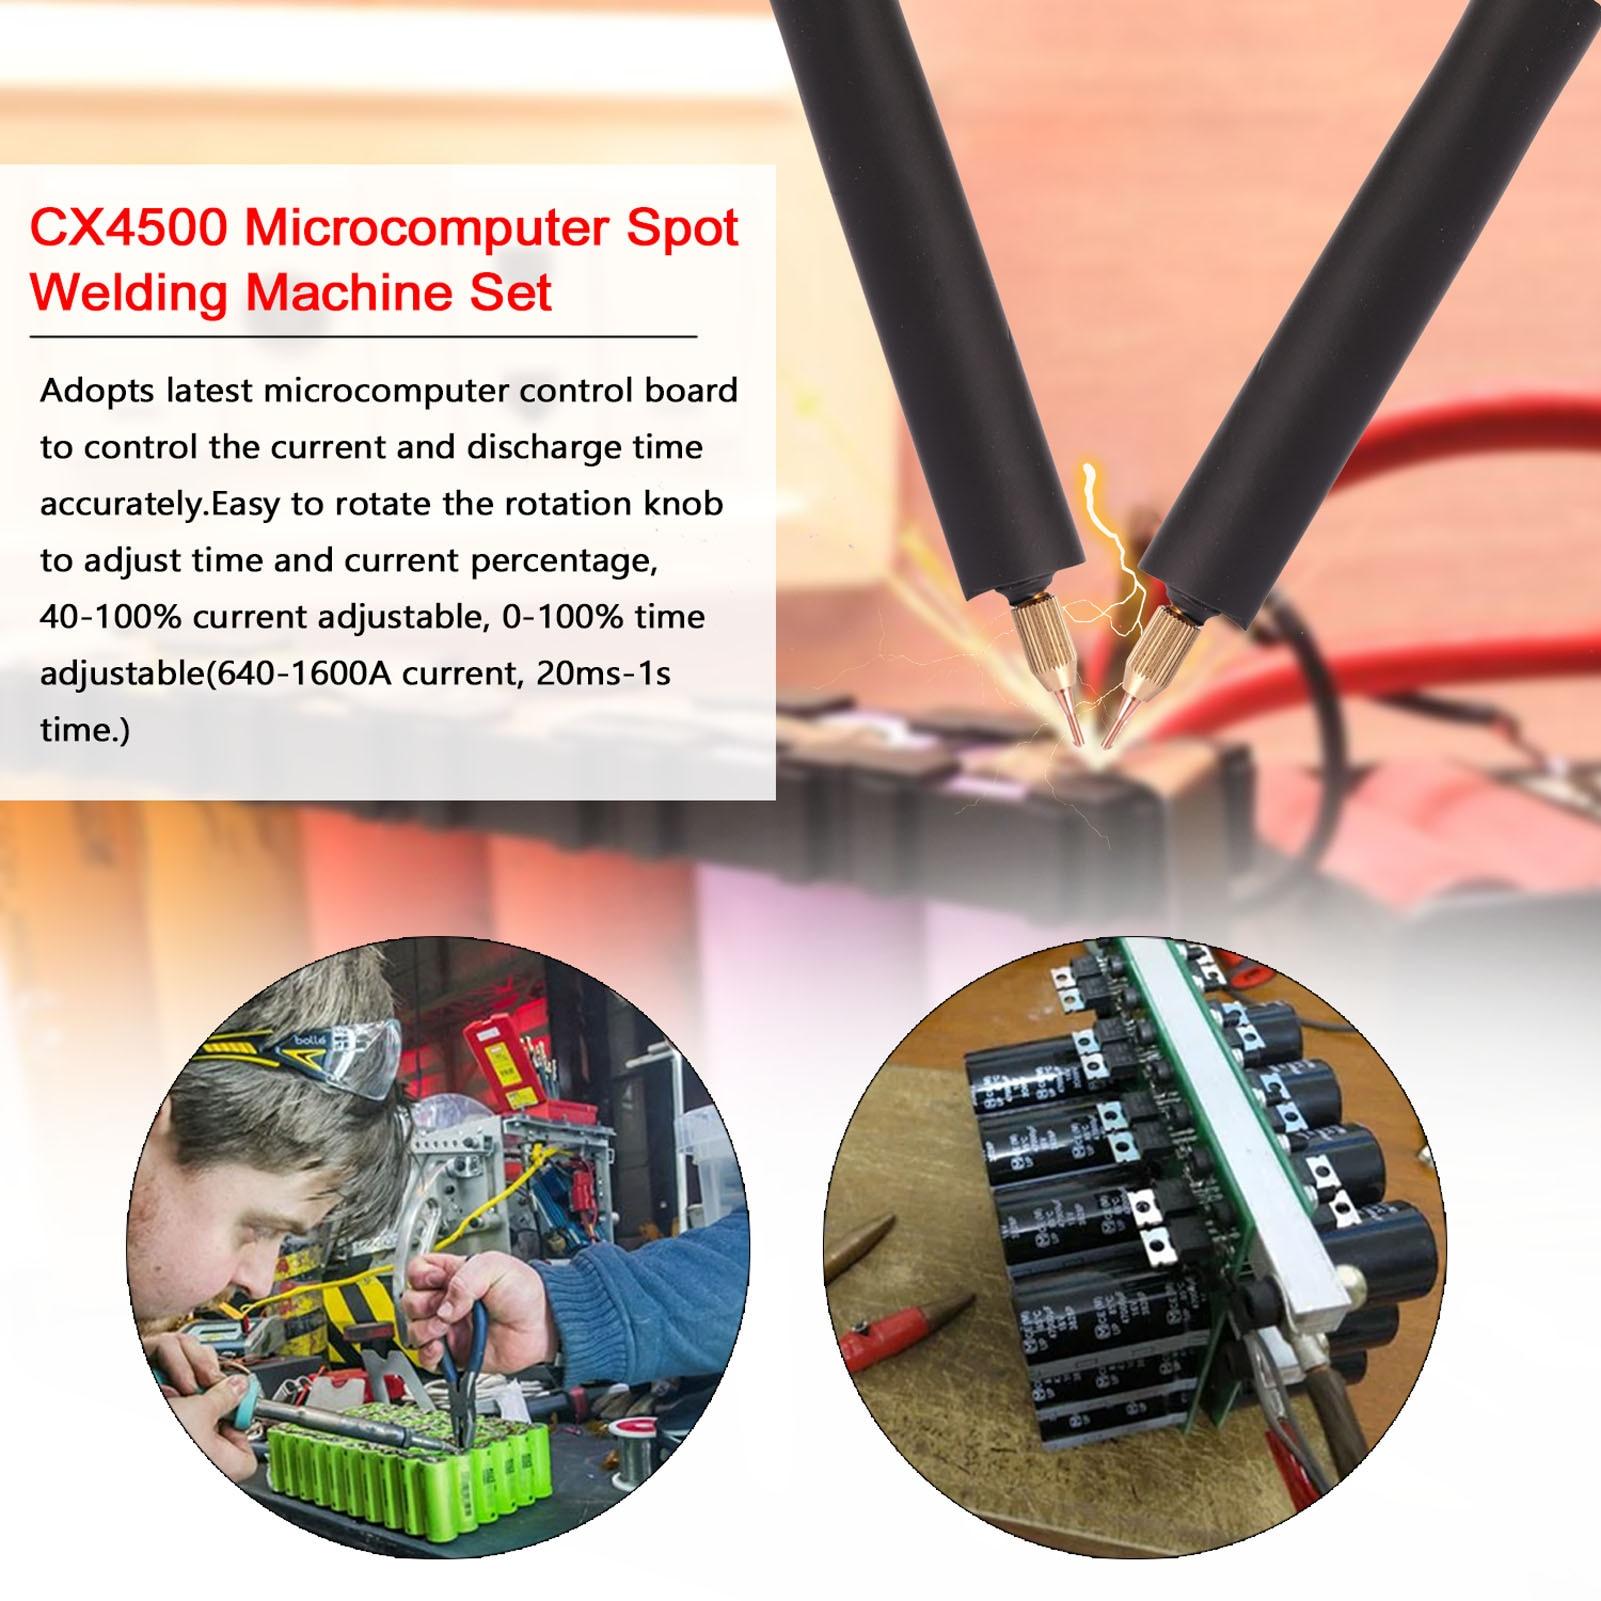 home improvement : 220V 110V Microcomputer Spot Welding Machine Set 20ms-1s Time Adjustable 640-1600A Current for 0 25mm Nickel-clad Steel Plate